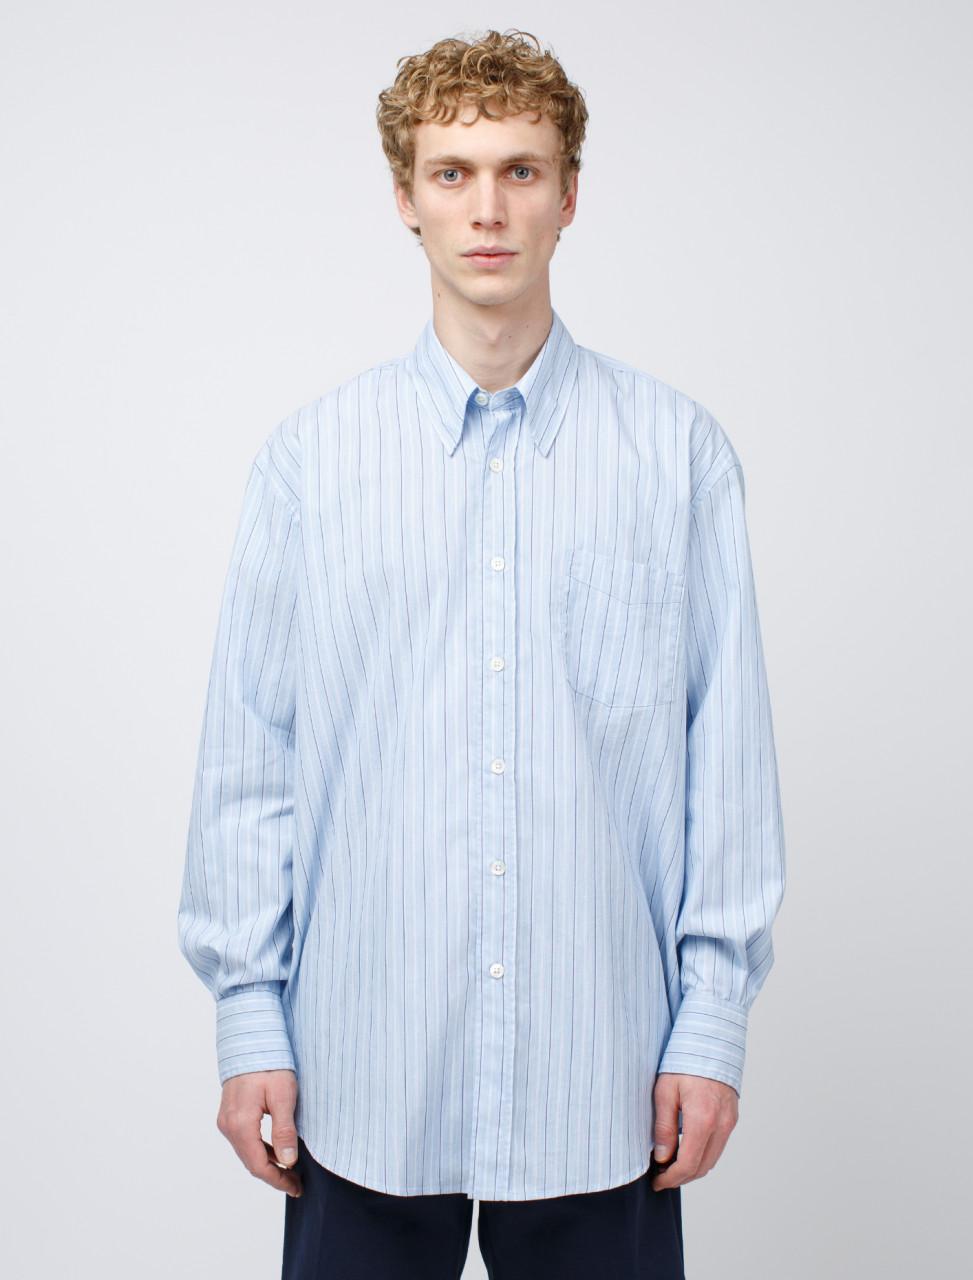 Less Borrowed Shirt